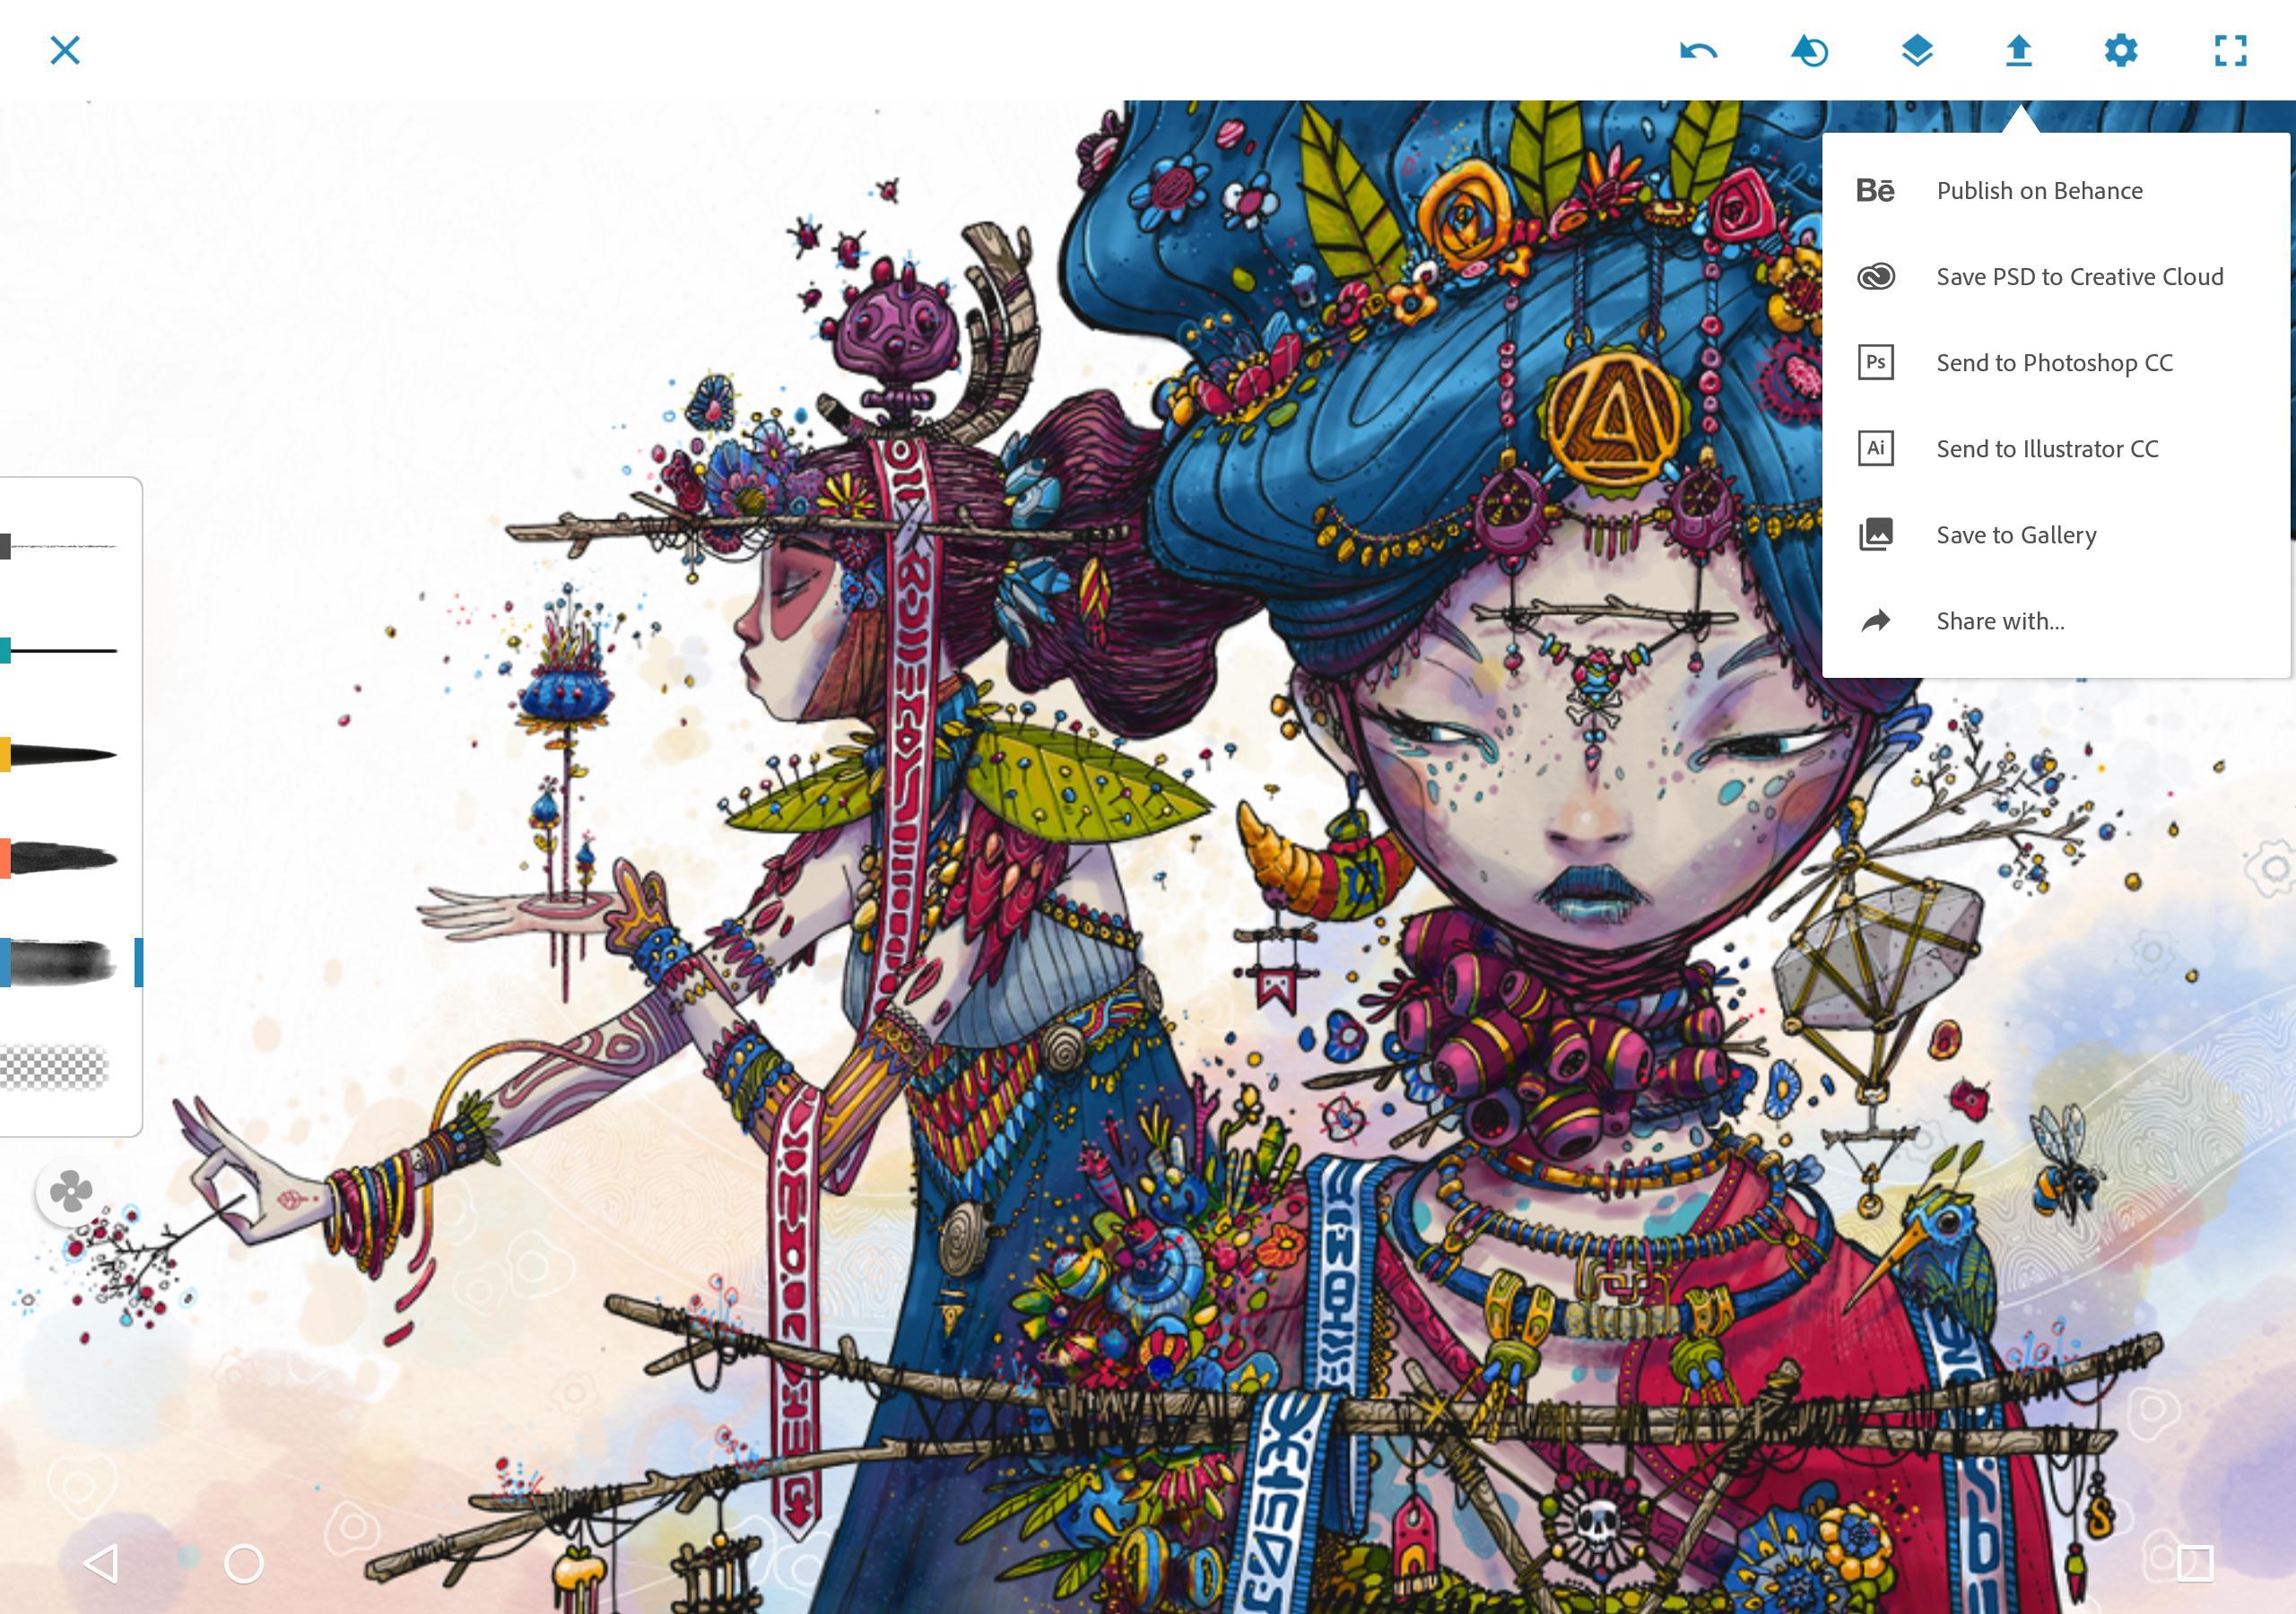 Aplikasi baru Adobe Photoshop Sketch